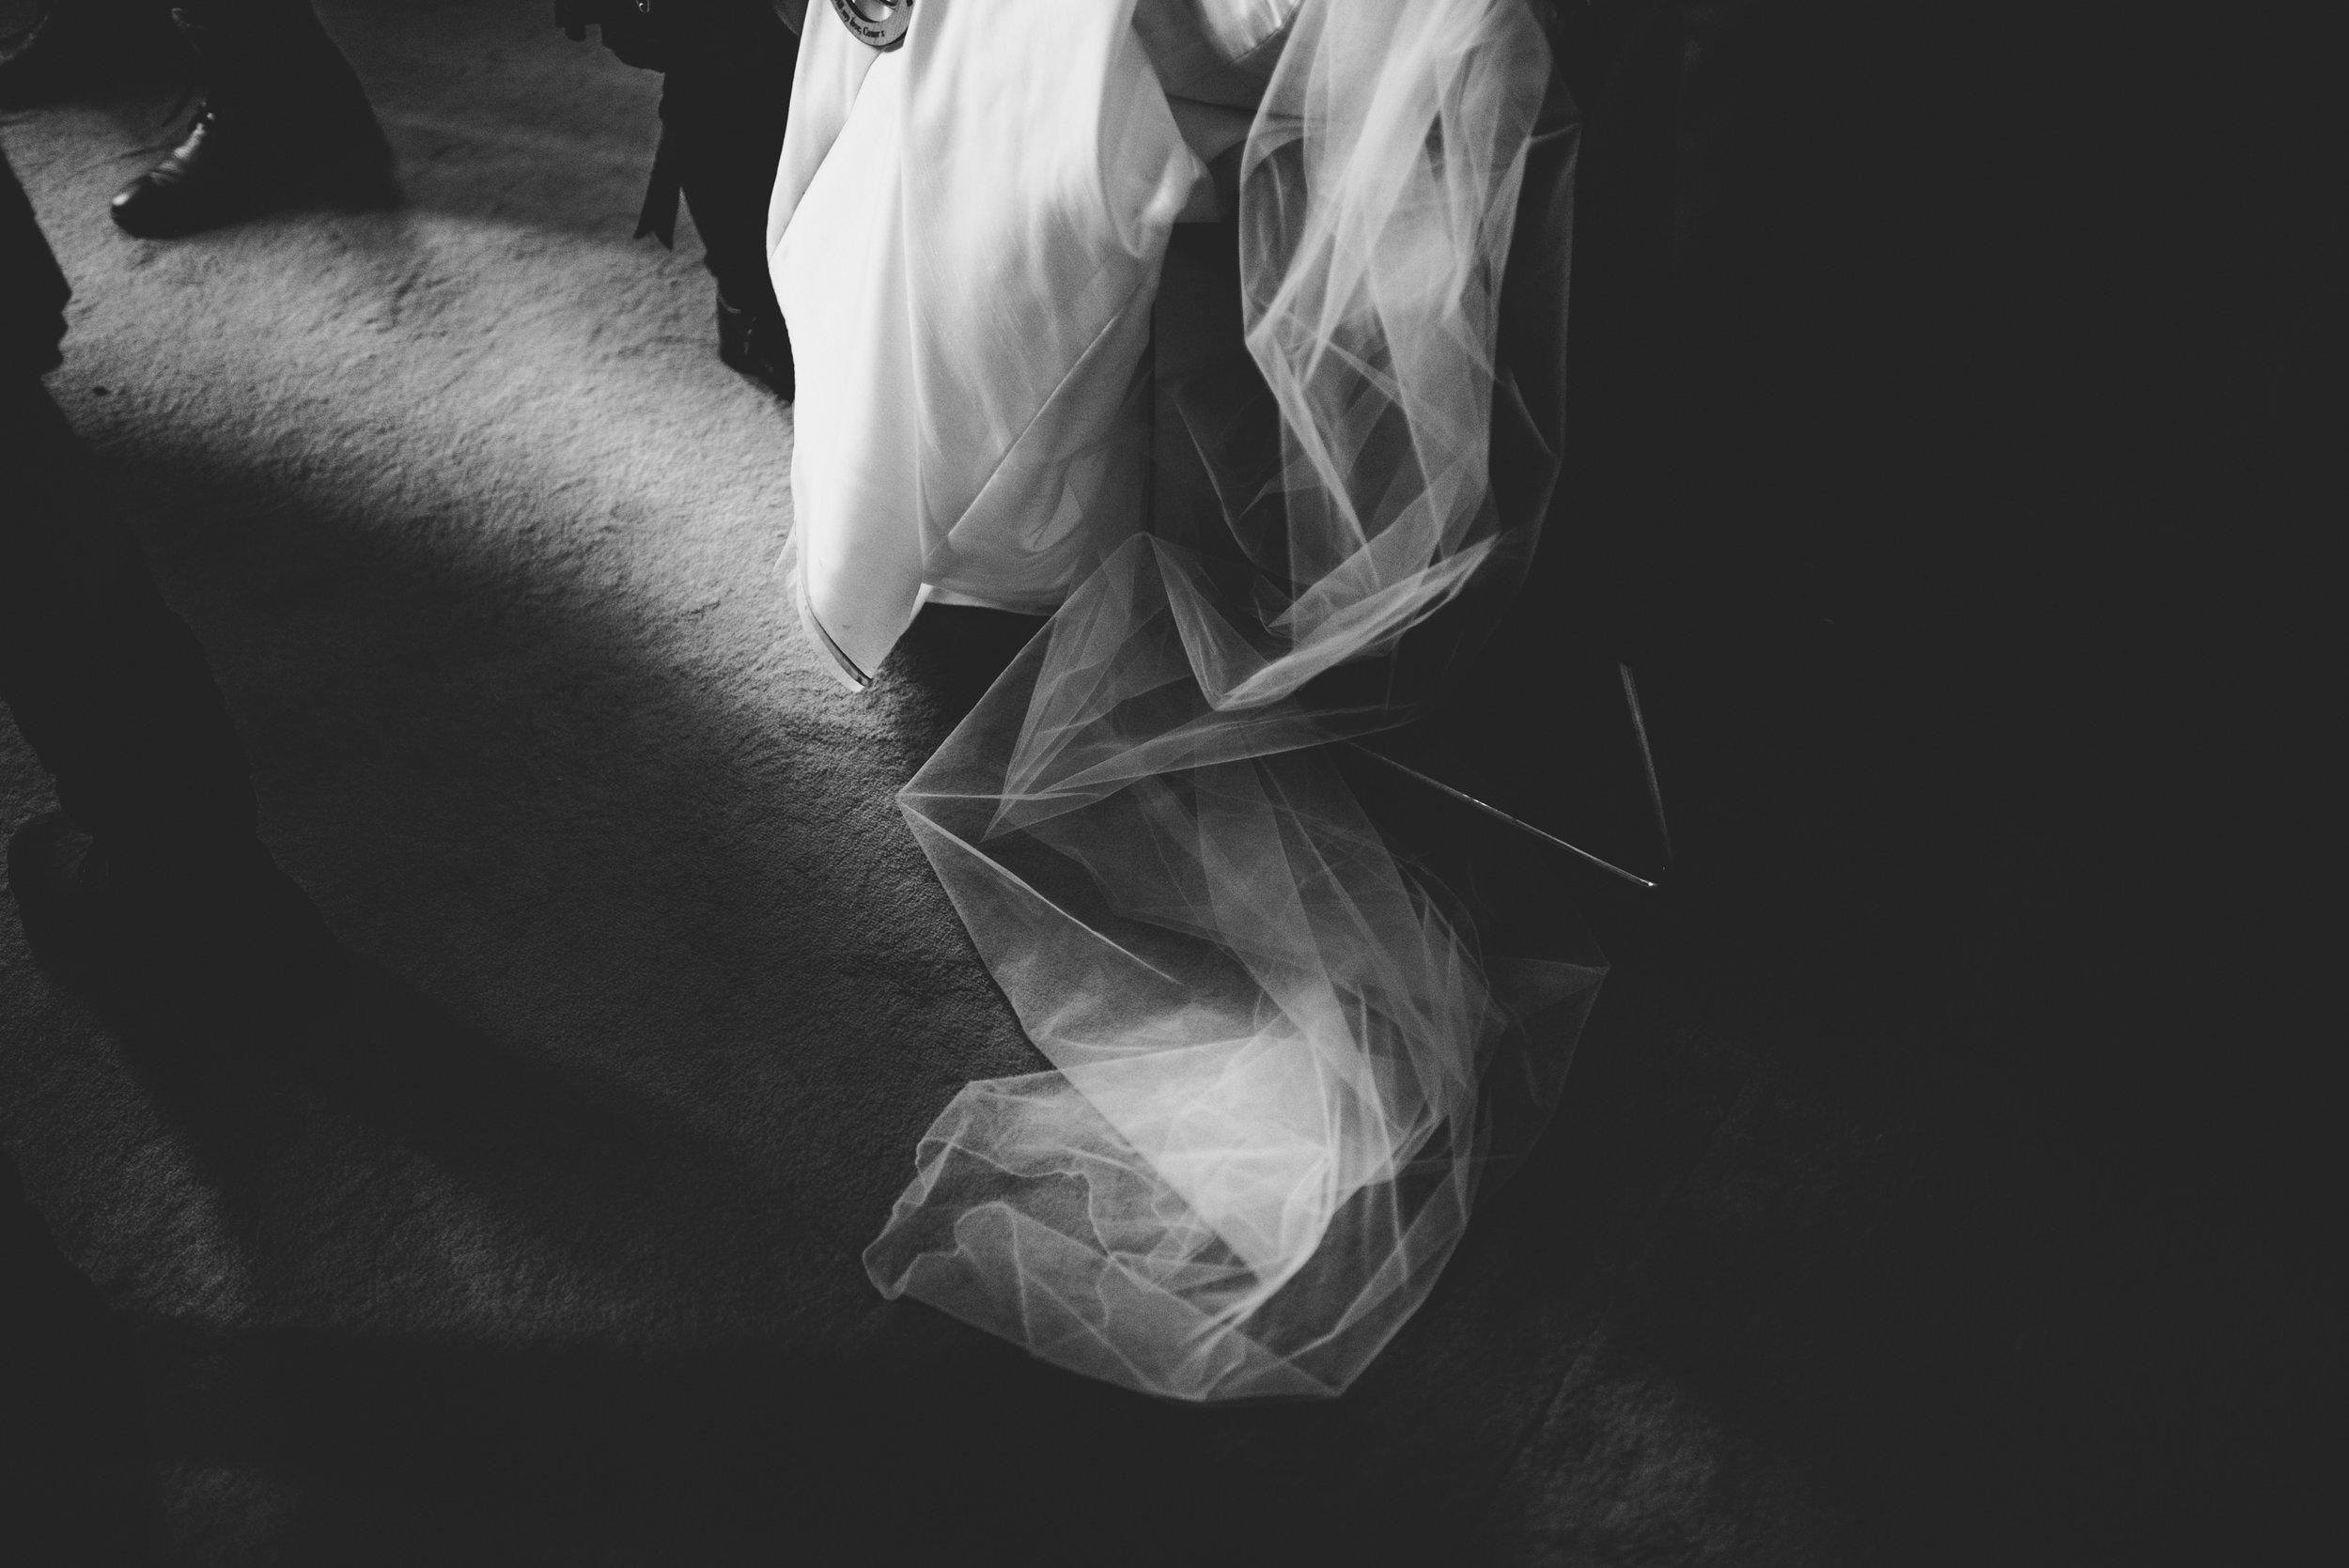 0171-LISA-DEVINE-PHOTOGRAPHY-ALTERNATIVE-WEDDING-PHOTOGRAPHY-SCOTLAND-DESTINATION-WEDDINGS-GLASGOW-WEDDINGS-COOL-WEDDINGS-STYLISH-WEDDINGS.JPG